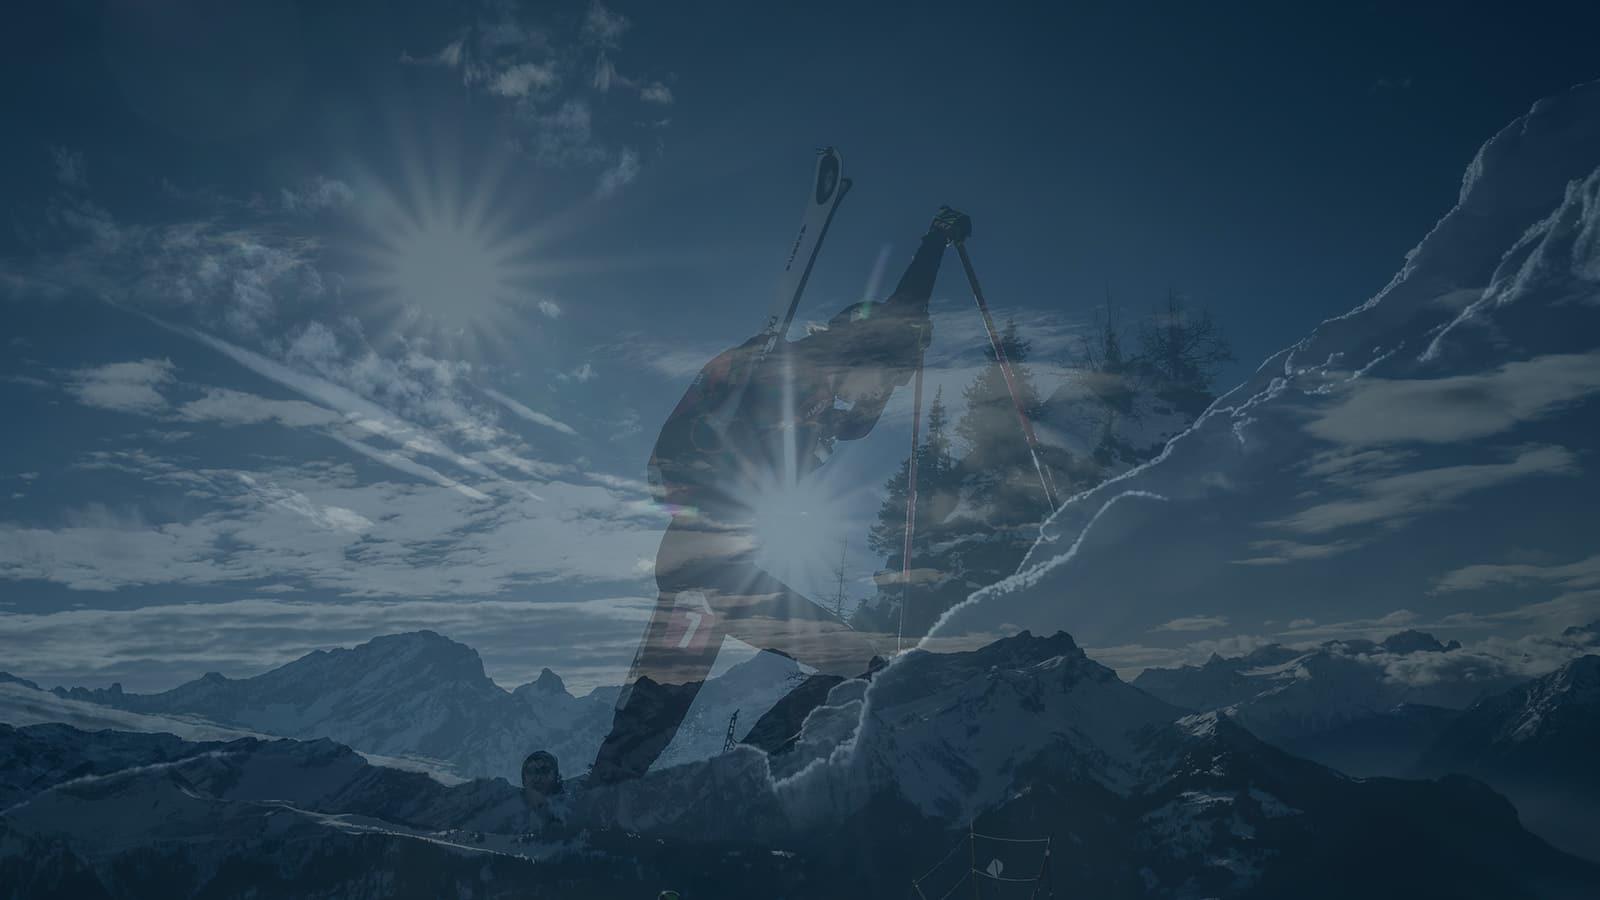 ismf-ski-mountaineering-magazine